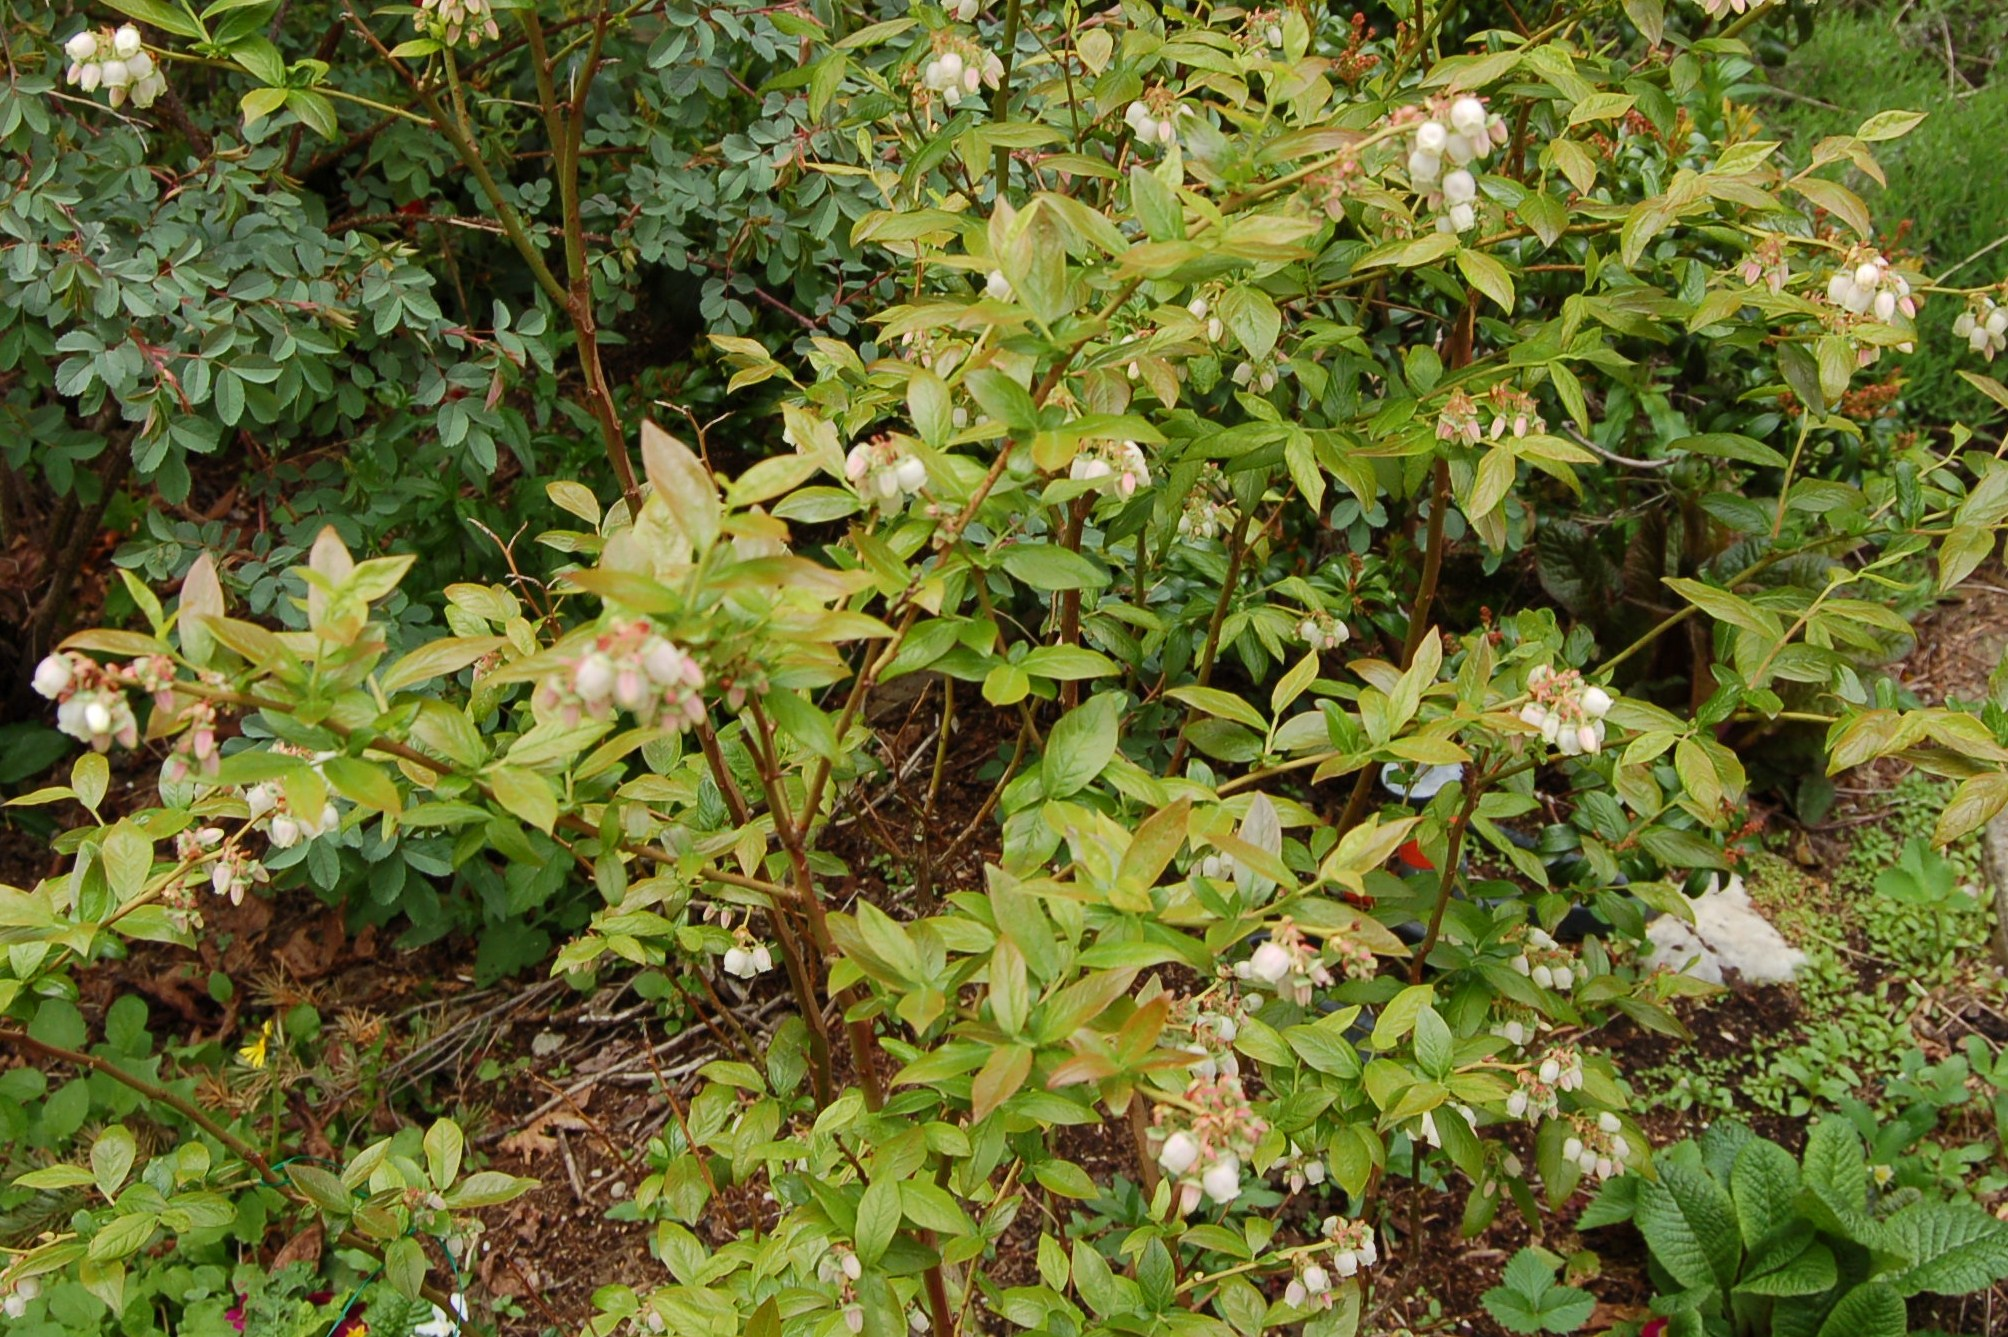 Blueberry bush, mid-May